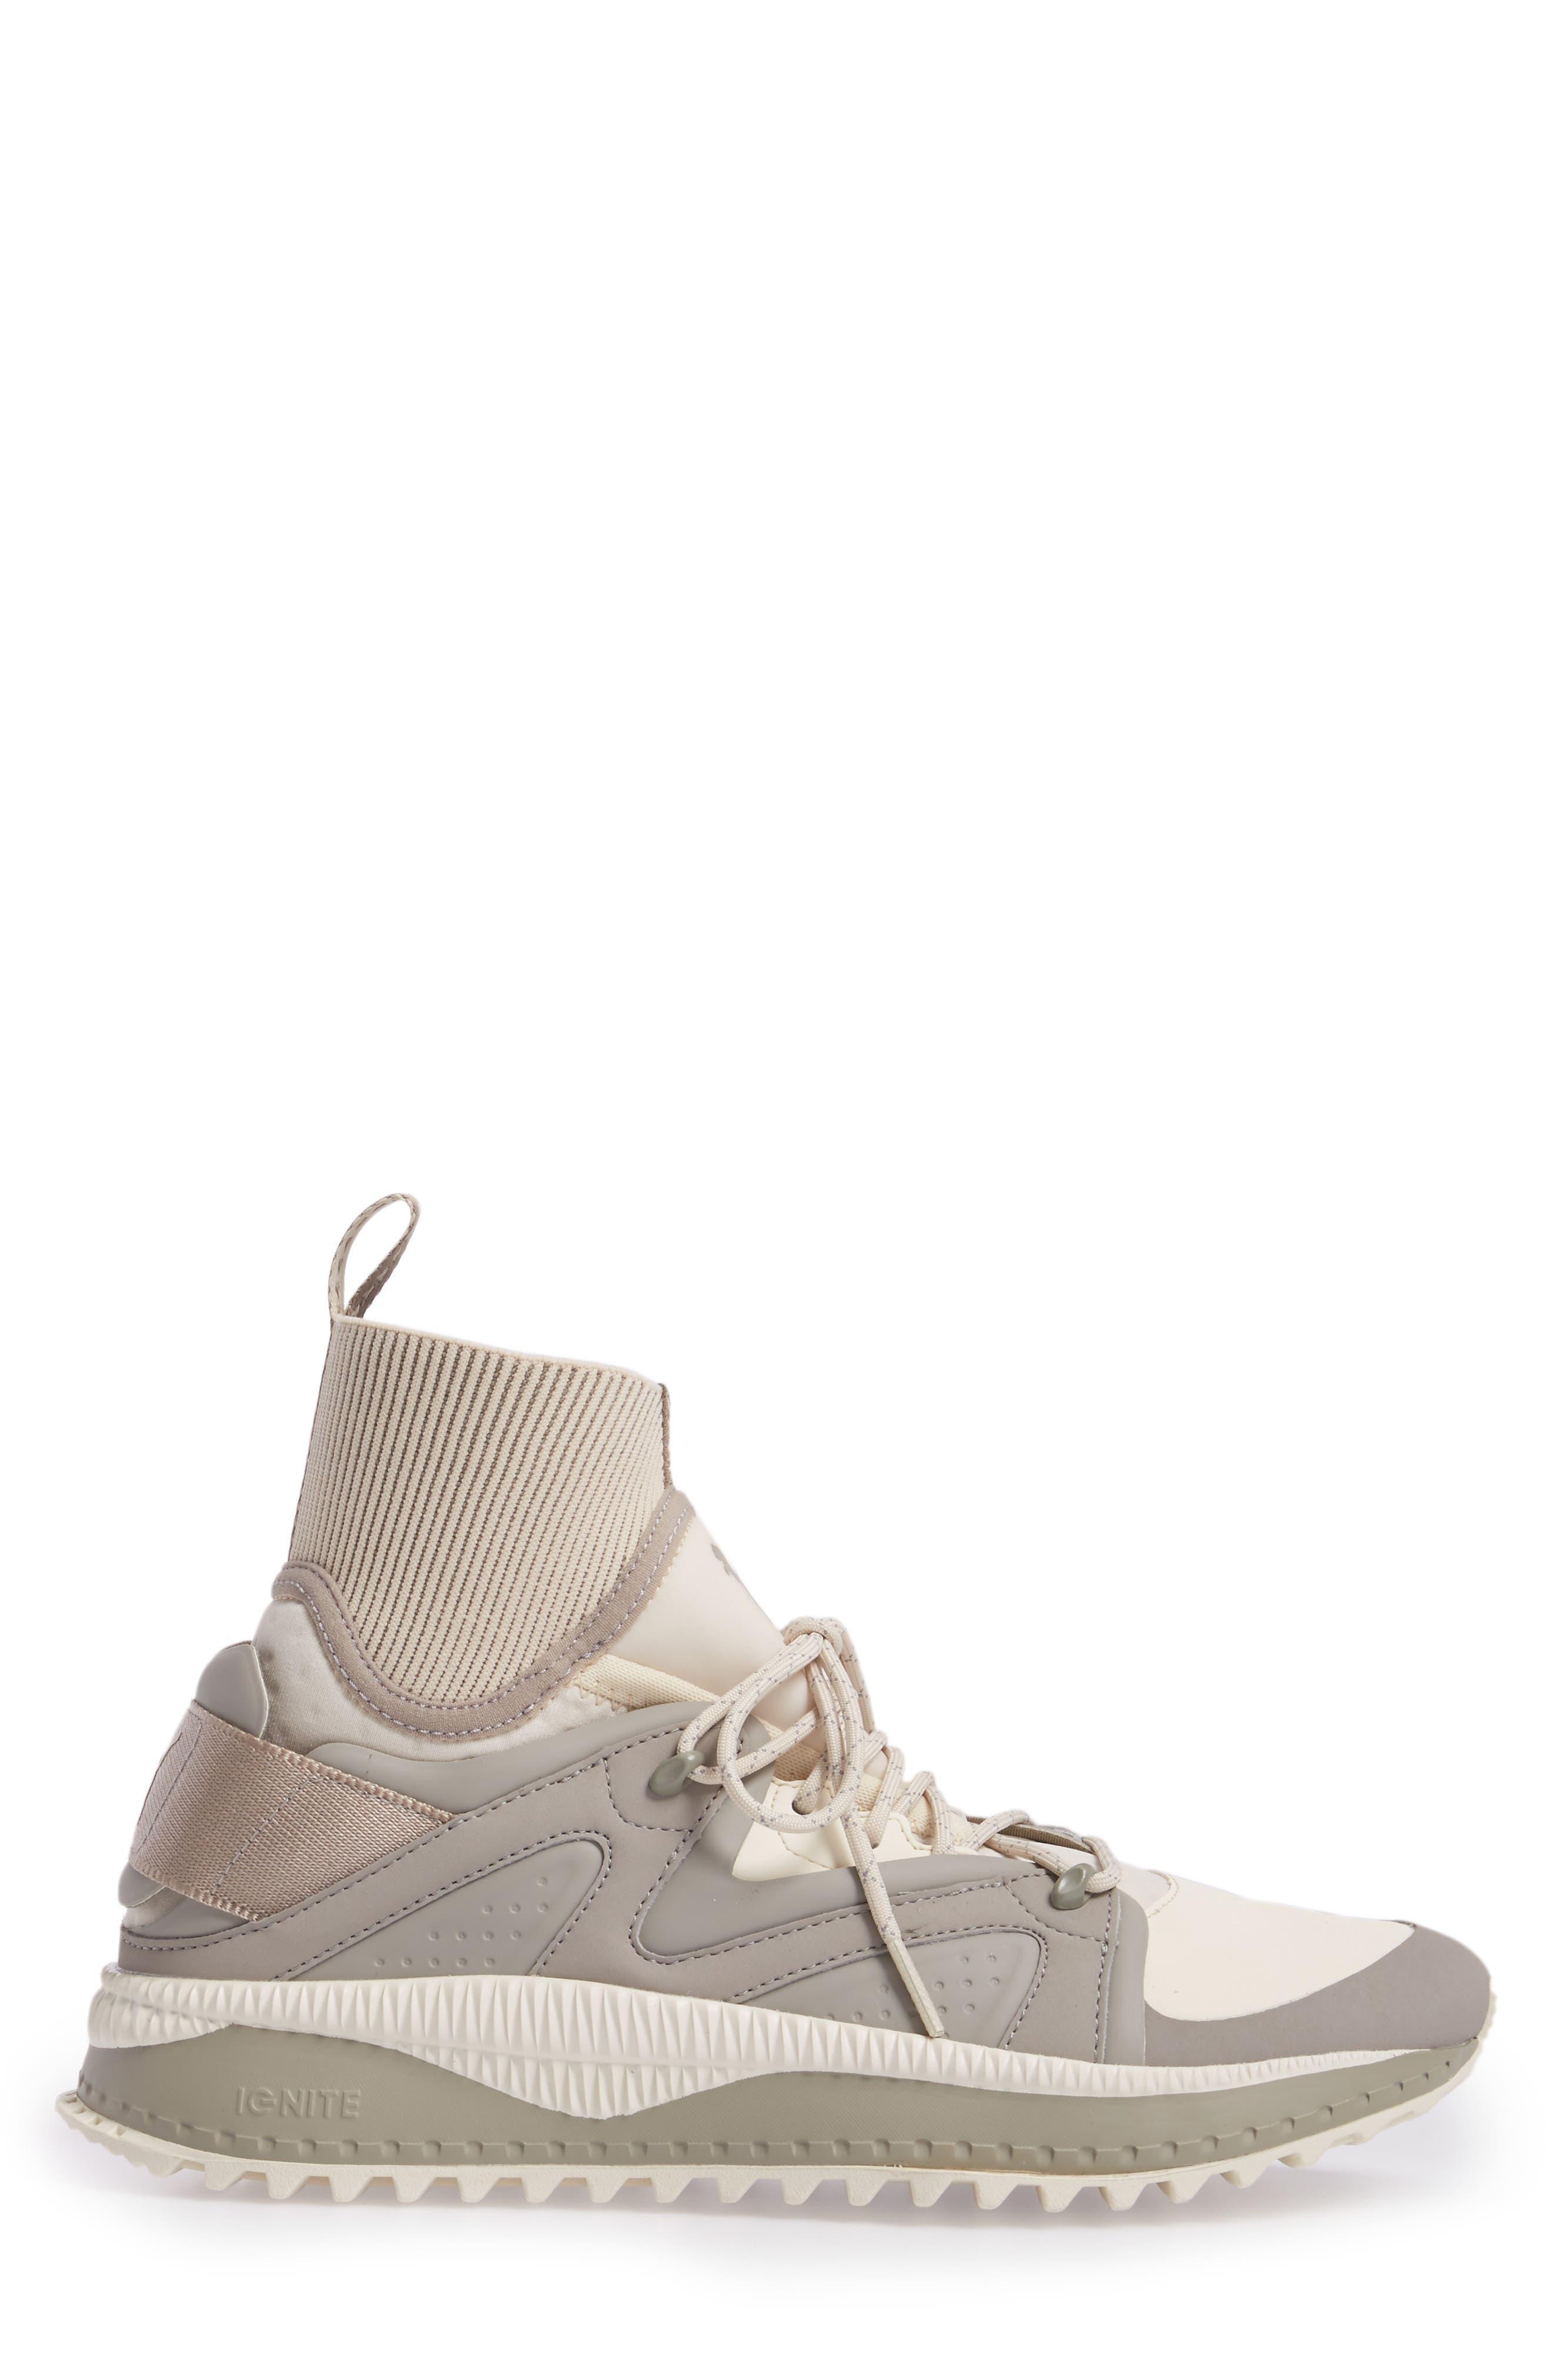 Tsugi Kori Sneaker,                             Alternate thumbnail 3, color,                             Rock Ridge/ Birch